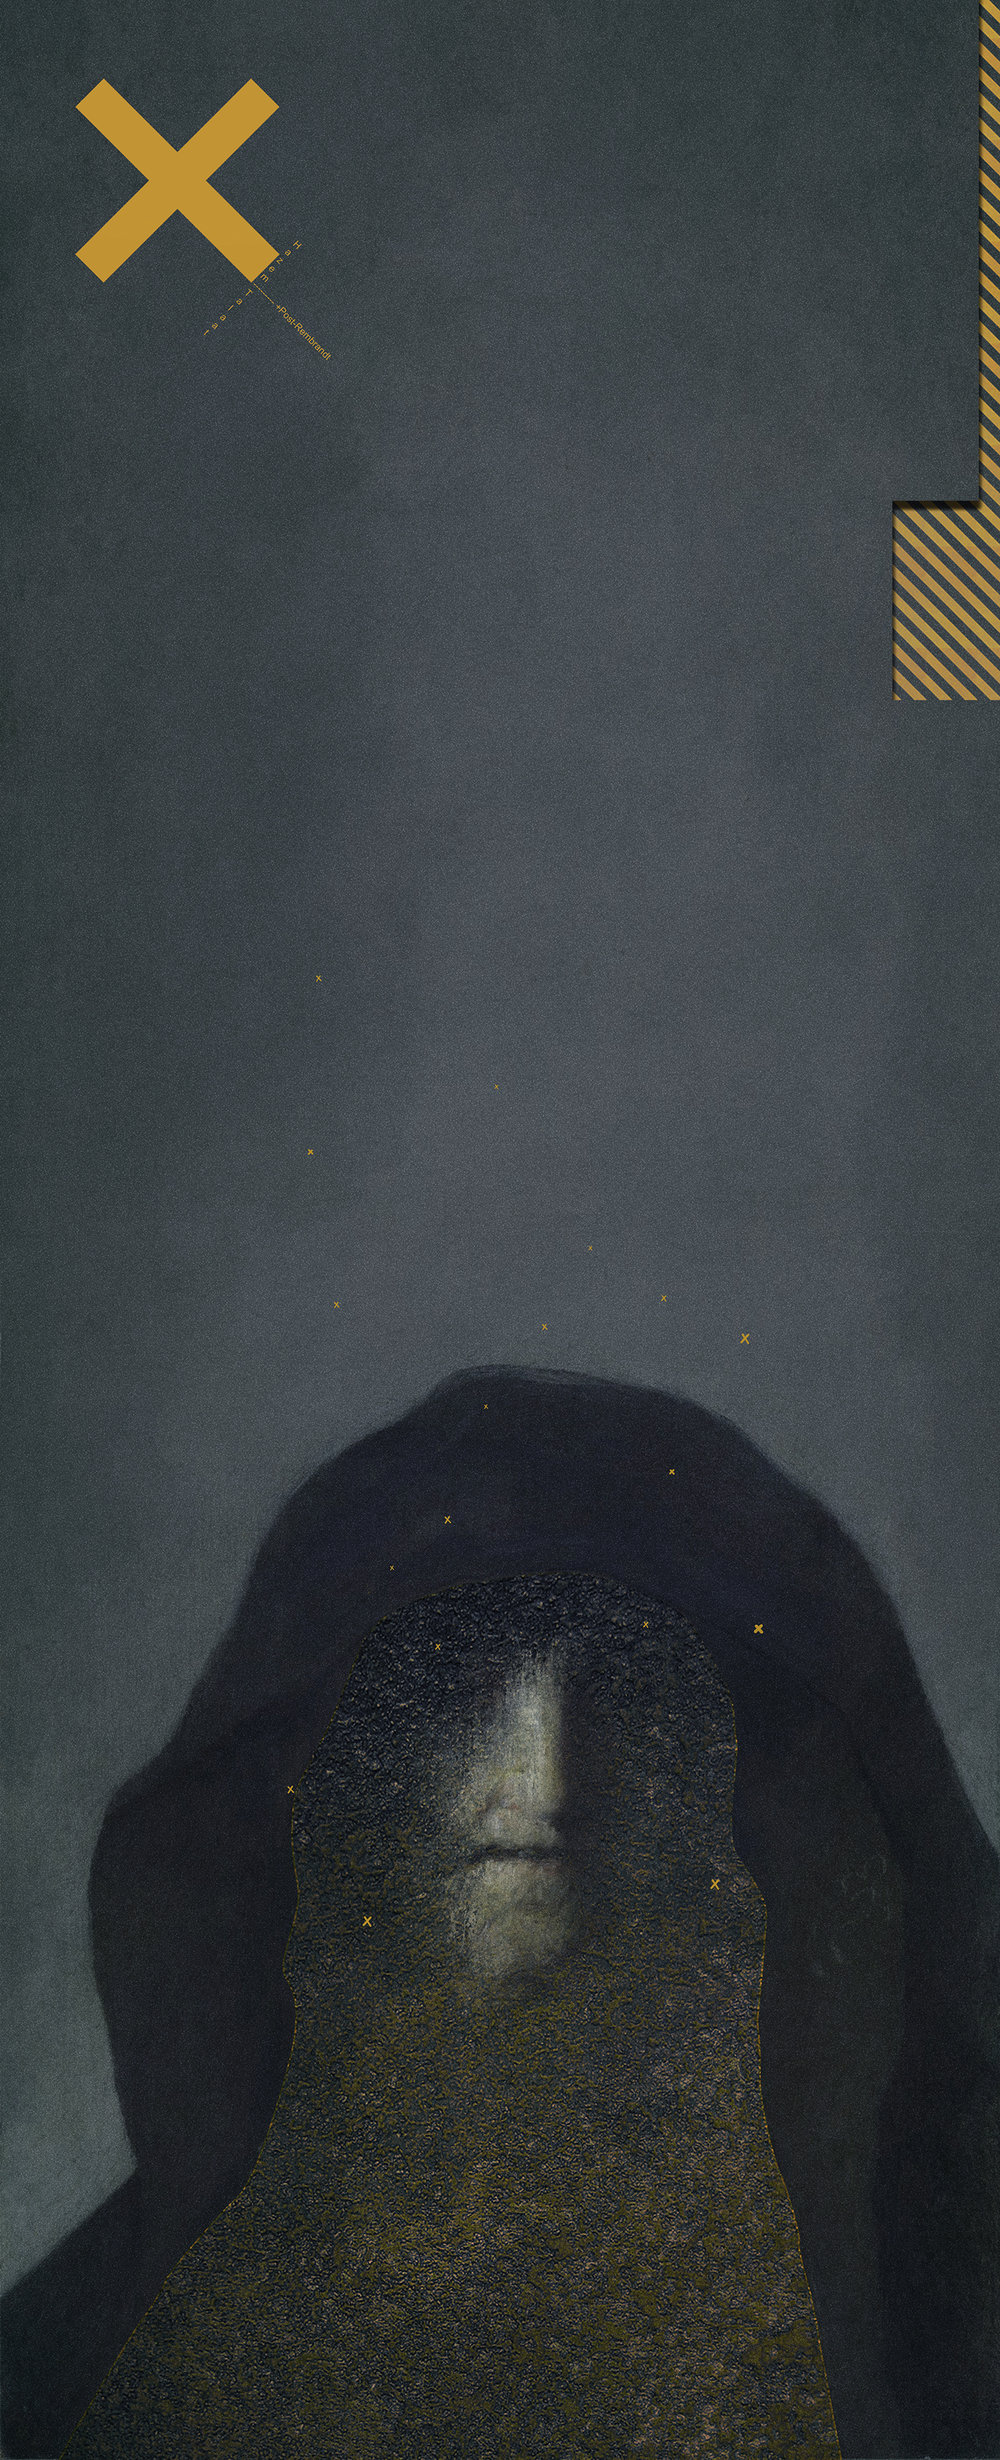 repainting rembrandt_ digital painting_ artist_hazem talaat